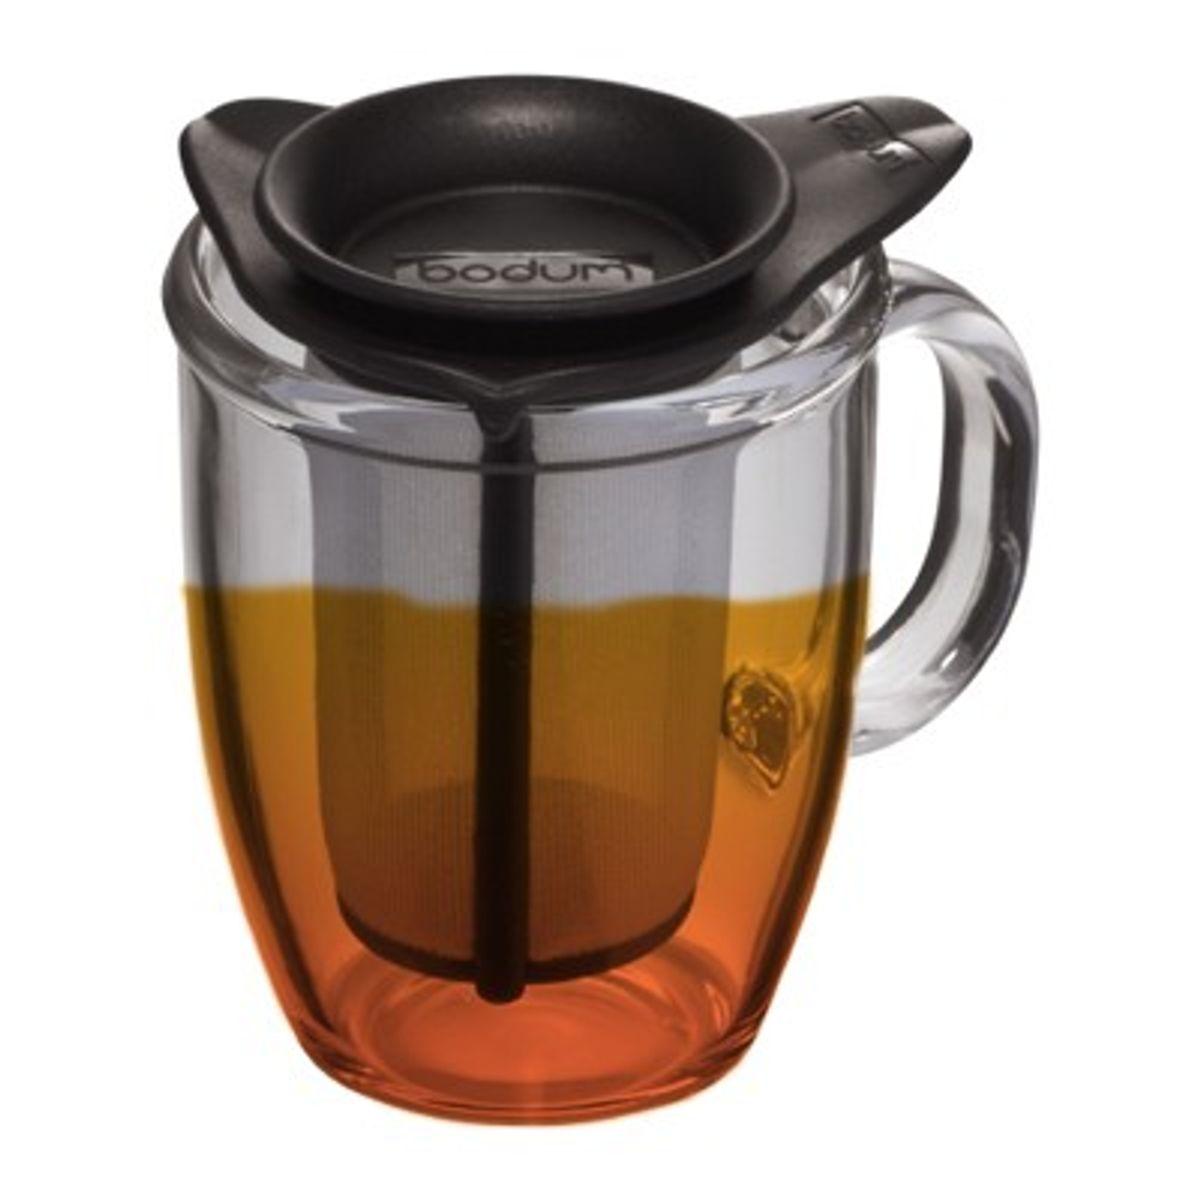 100 bodum glass coffee mugs with bodum travel press set herbal tea coffee mug cup maker 0. Black Bedroom Furniture Sets. Home Design Ideas